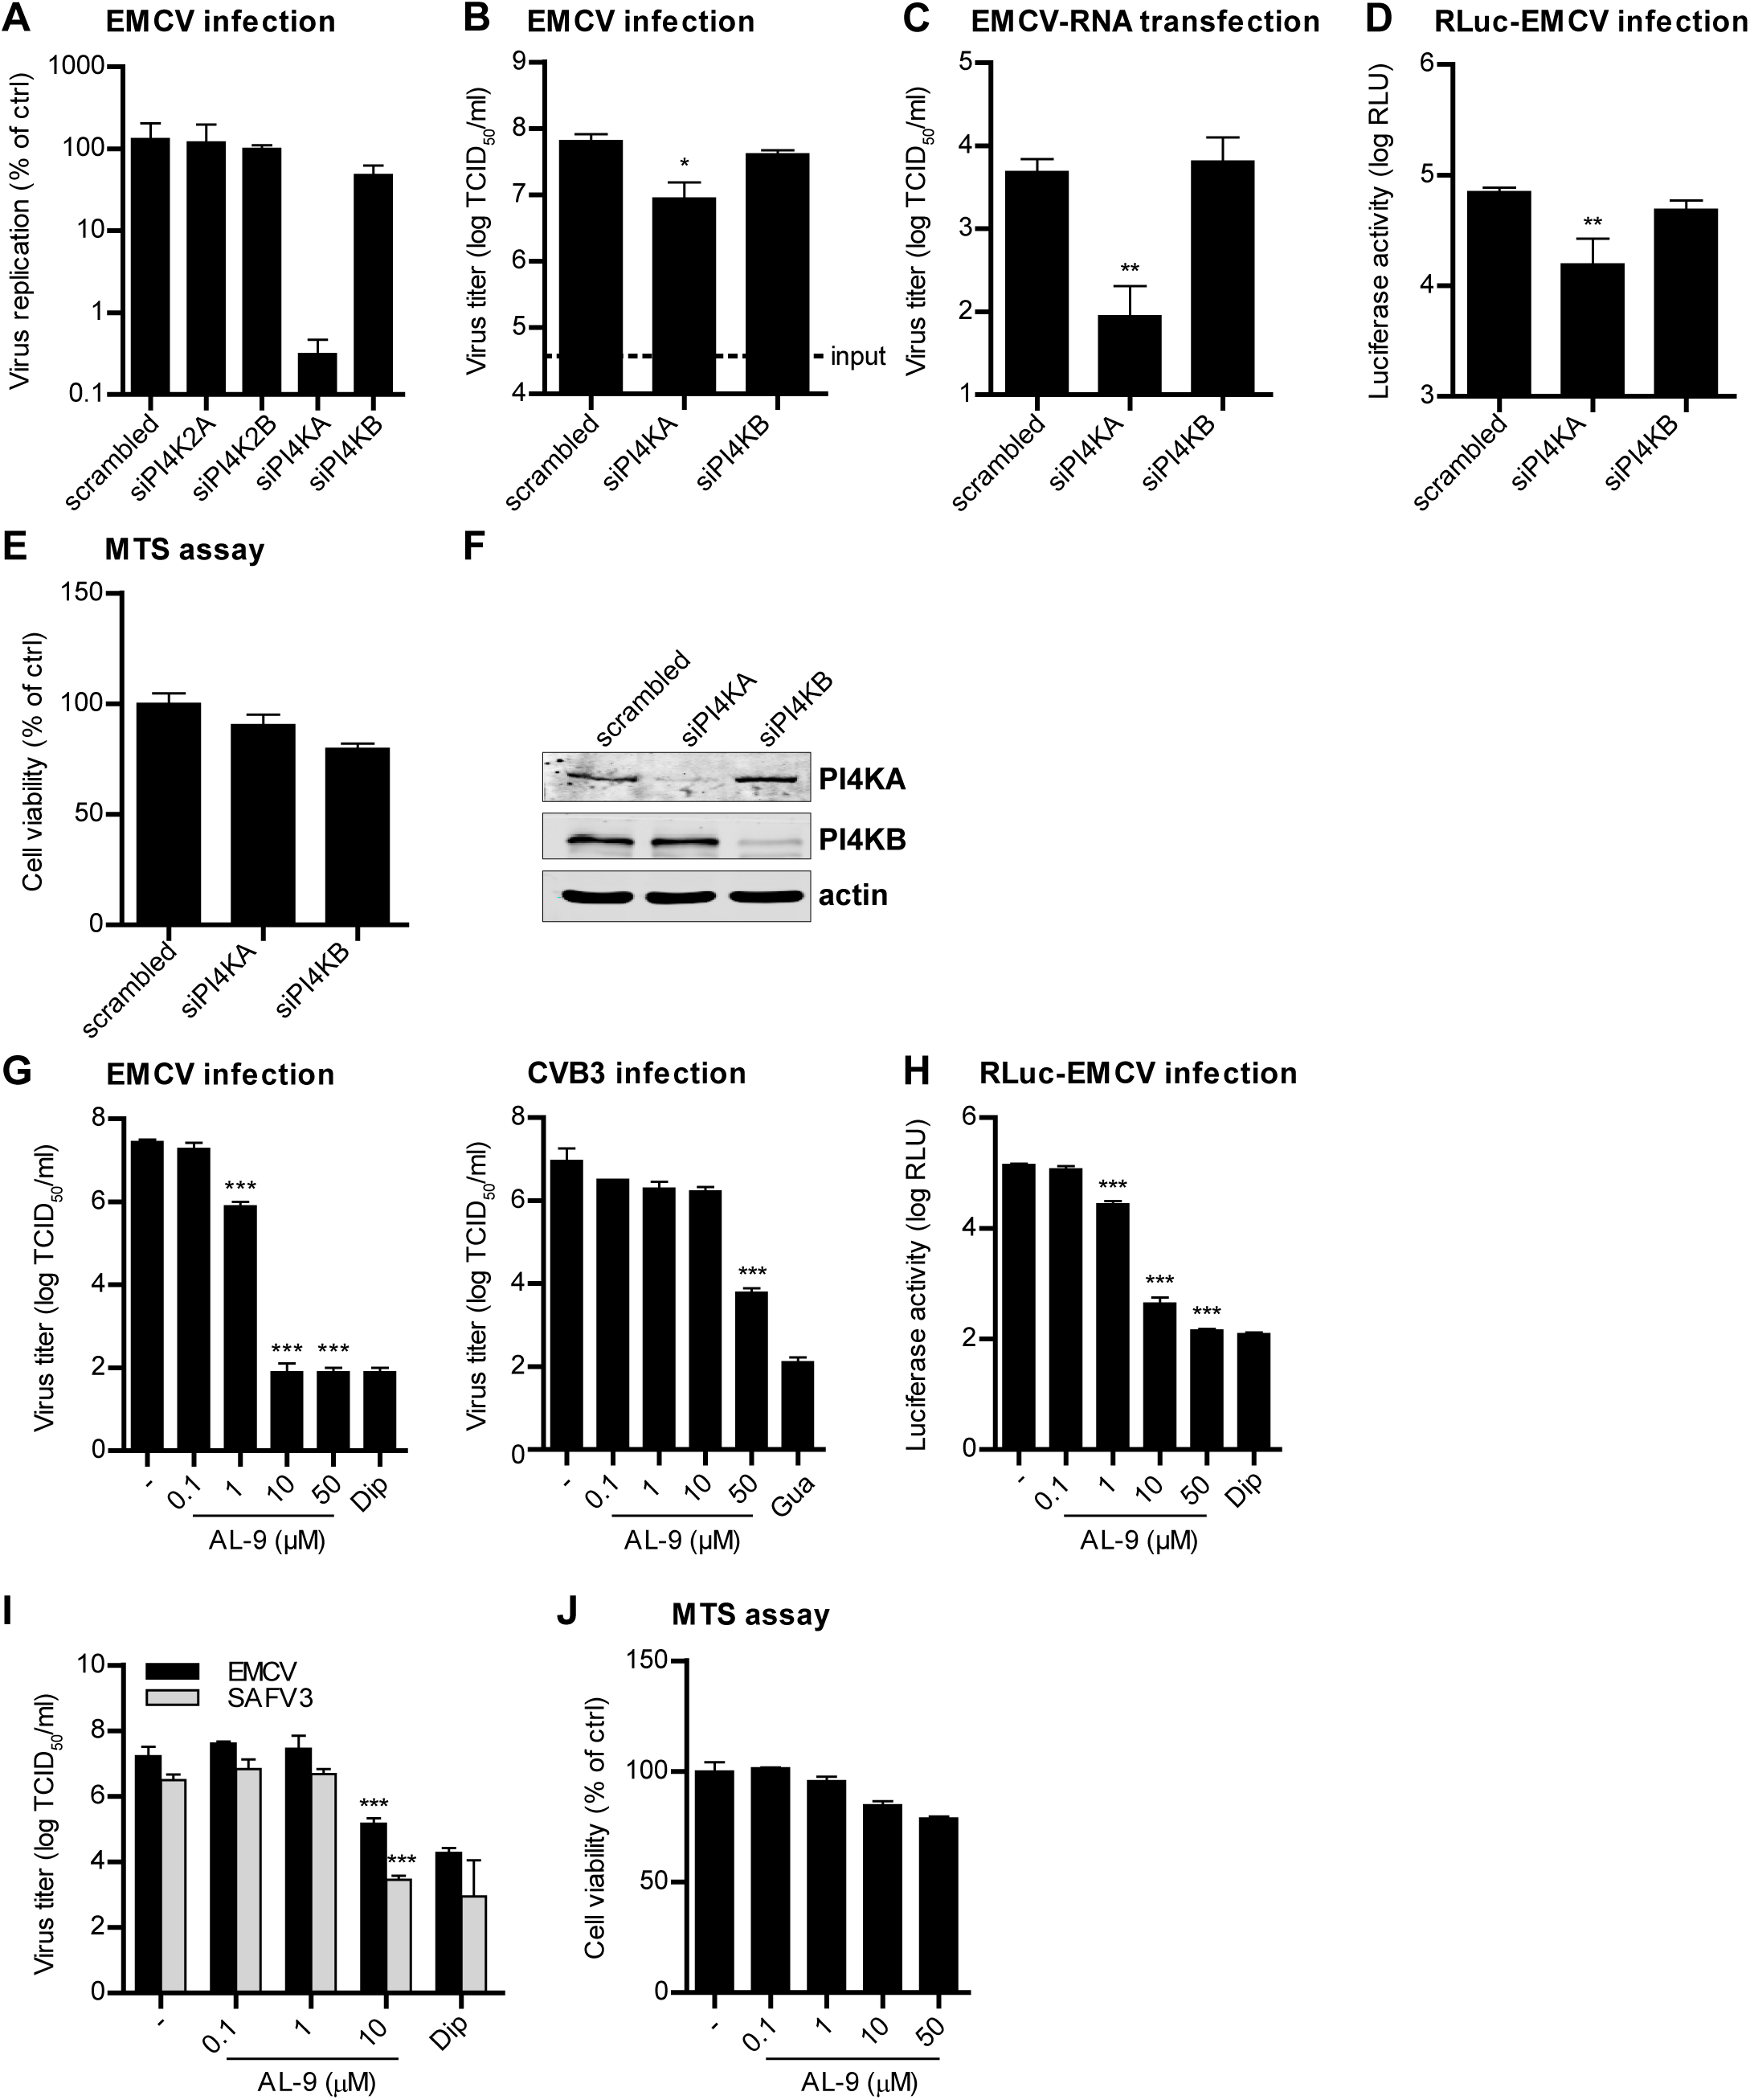 PI4KA is essential for cardiovirus replication.